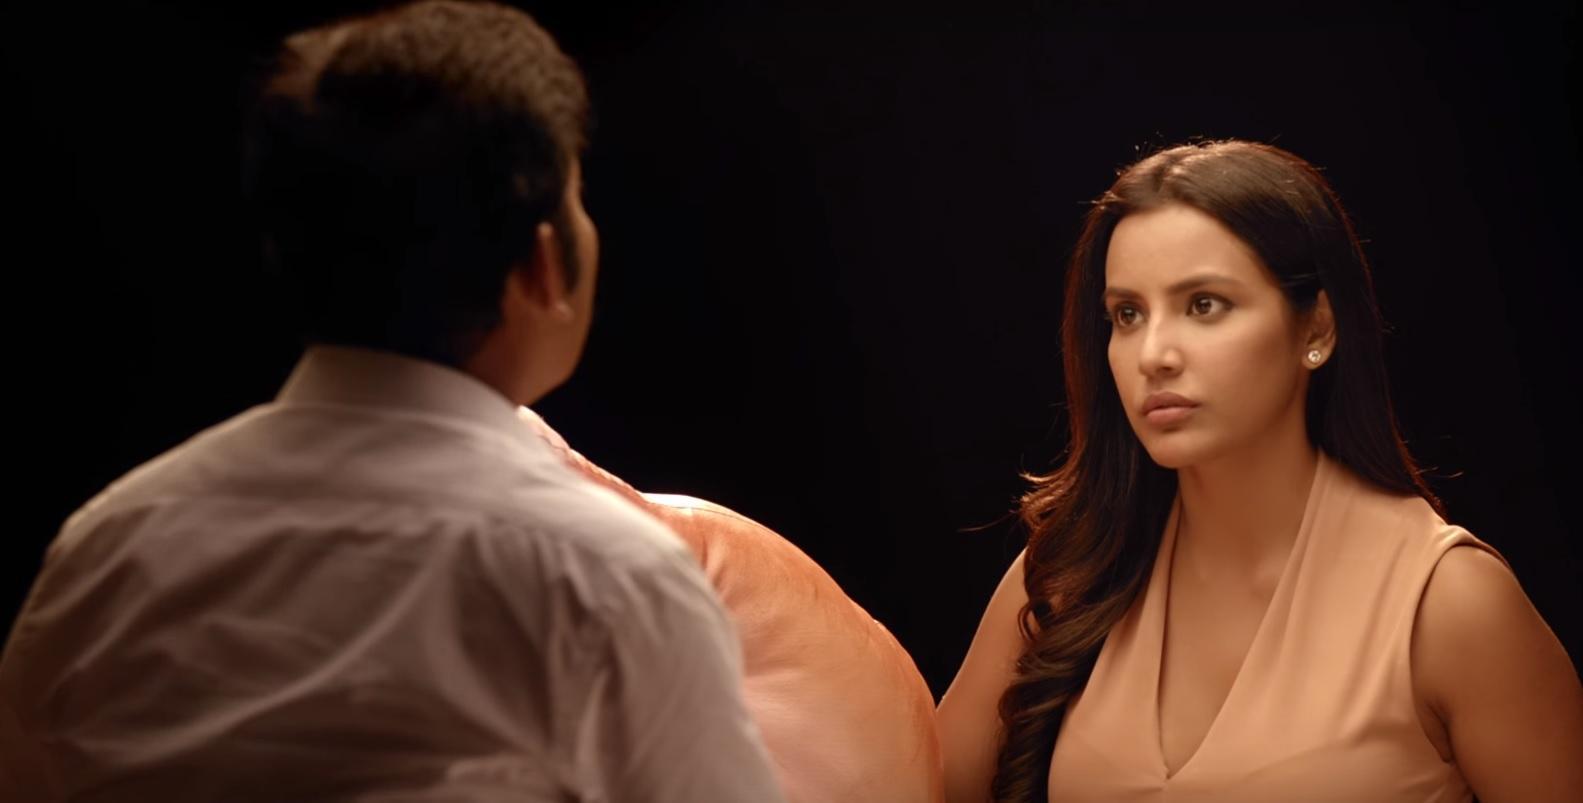 lkg-tamil-movie-review-images-hd-rj-balaji-priya-anand-hot-stills-political-drama